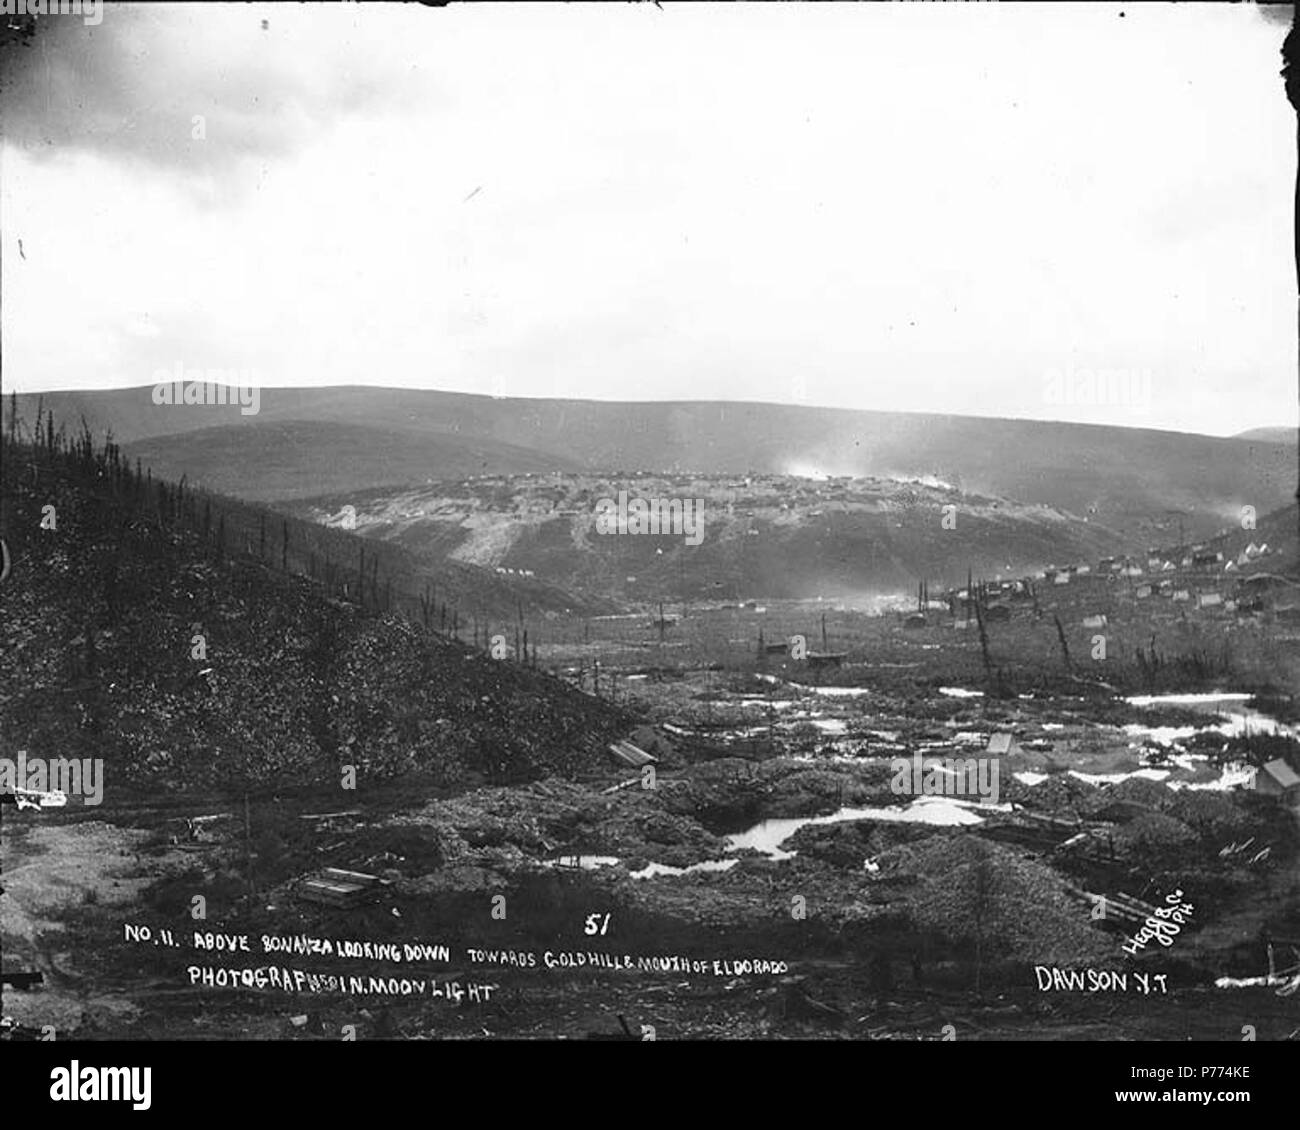 . English: Mining claims at the junction of Bonanza Creek and Eldorado Creek, Yukon Territory, ca. 1898. English: Caption on image: 'No. 11 above Bonanza looking down towards Gold Hill and mouth of Eldorado . Photographed in moonlight/Hegg & Co., Dawson, Y.T.' Klondike Gold Rush. Subjects (LCTGM): Mining claims--Yukon; Rivers--Yukon Subjects (LCSH): Gold Hill (Yukon); Yukon--Gold discoveries  . circa 1898 9 Mining claims at the junction of Bonanza Creek and Eldorado Creek, Yukon Territory, ca 1898 (HEGG 577) - Stock Image